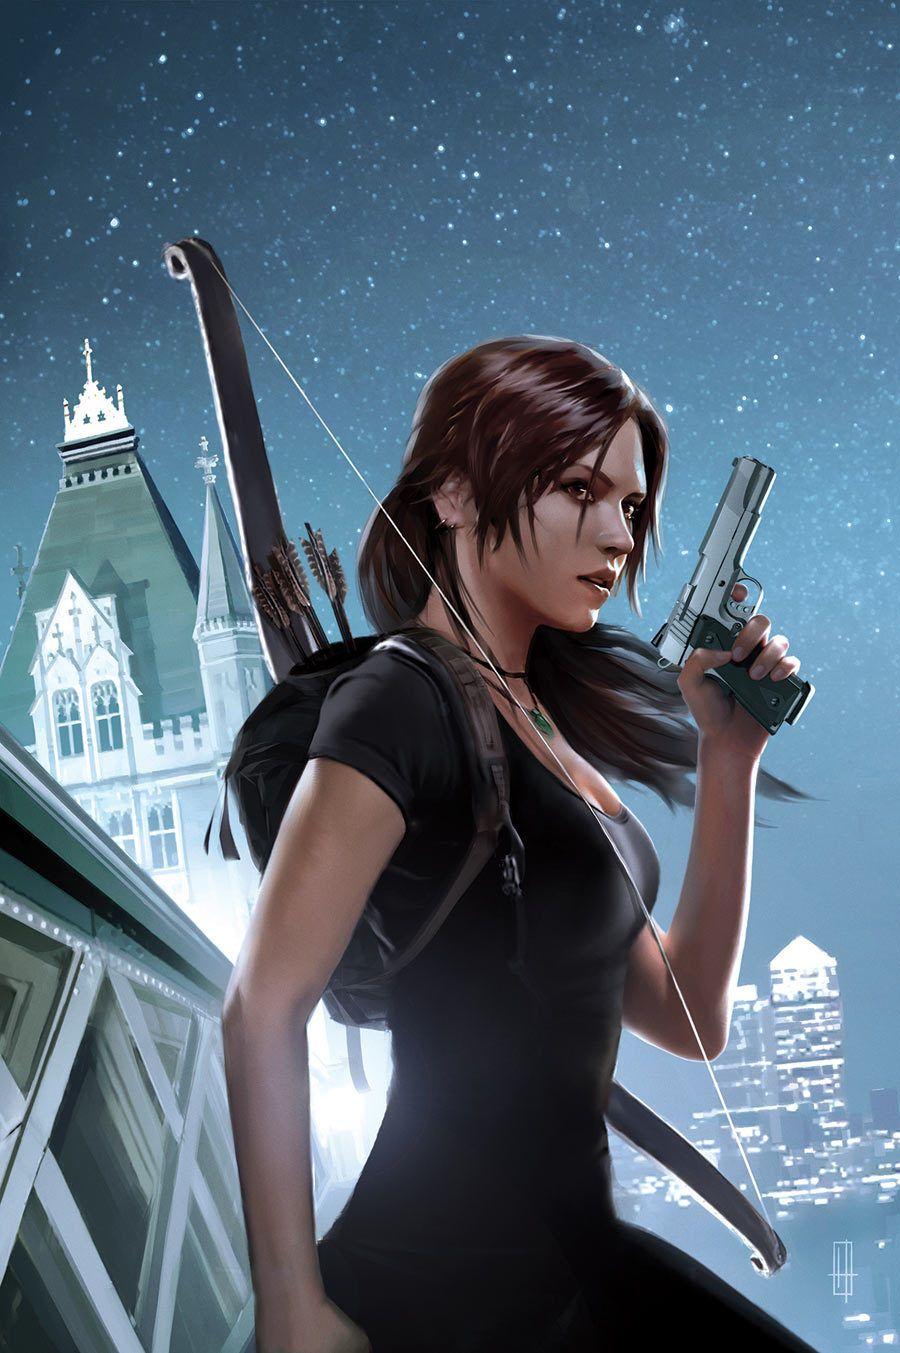 Young Lara Croft Tomb Raider 12 By Brian Horton Tomb Raider